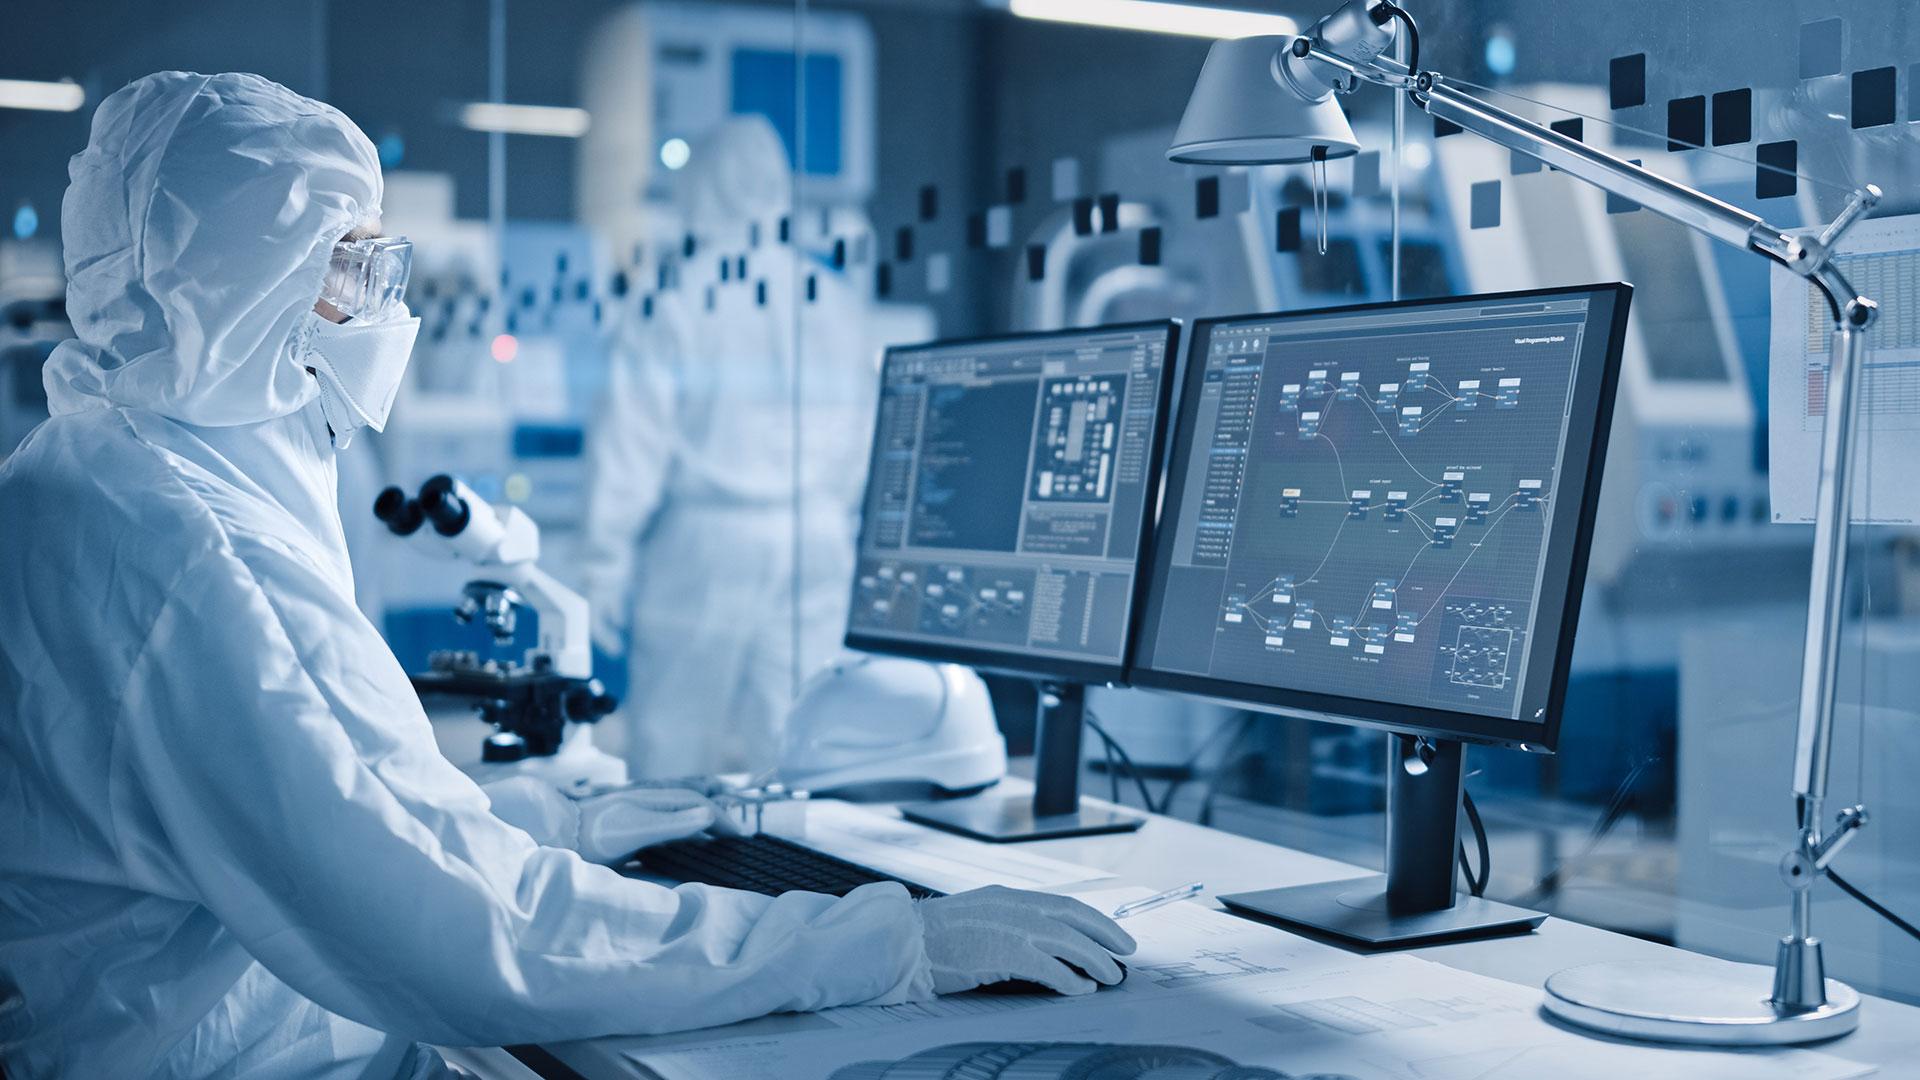 IT Insight 製造業向けシステムのクラウドサービス化